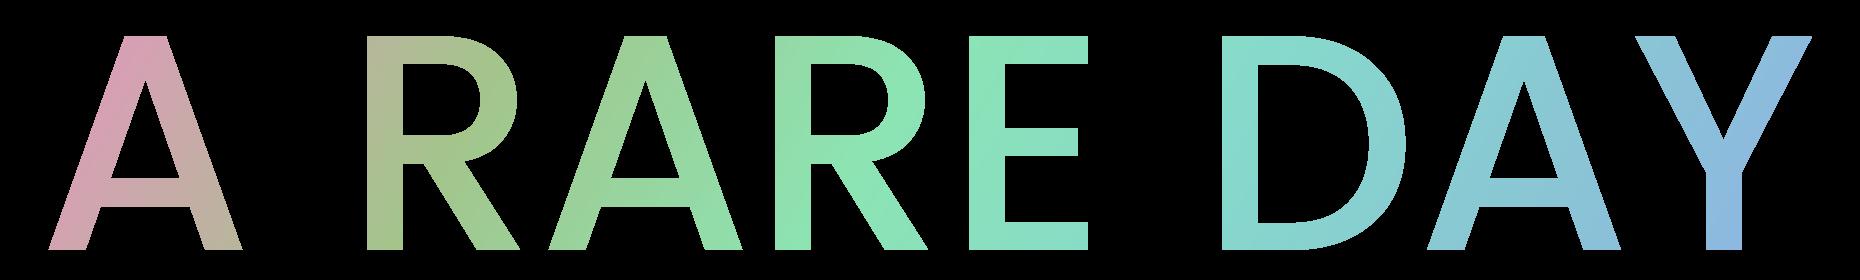 ARAREDAY_logo_prism.png